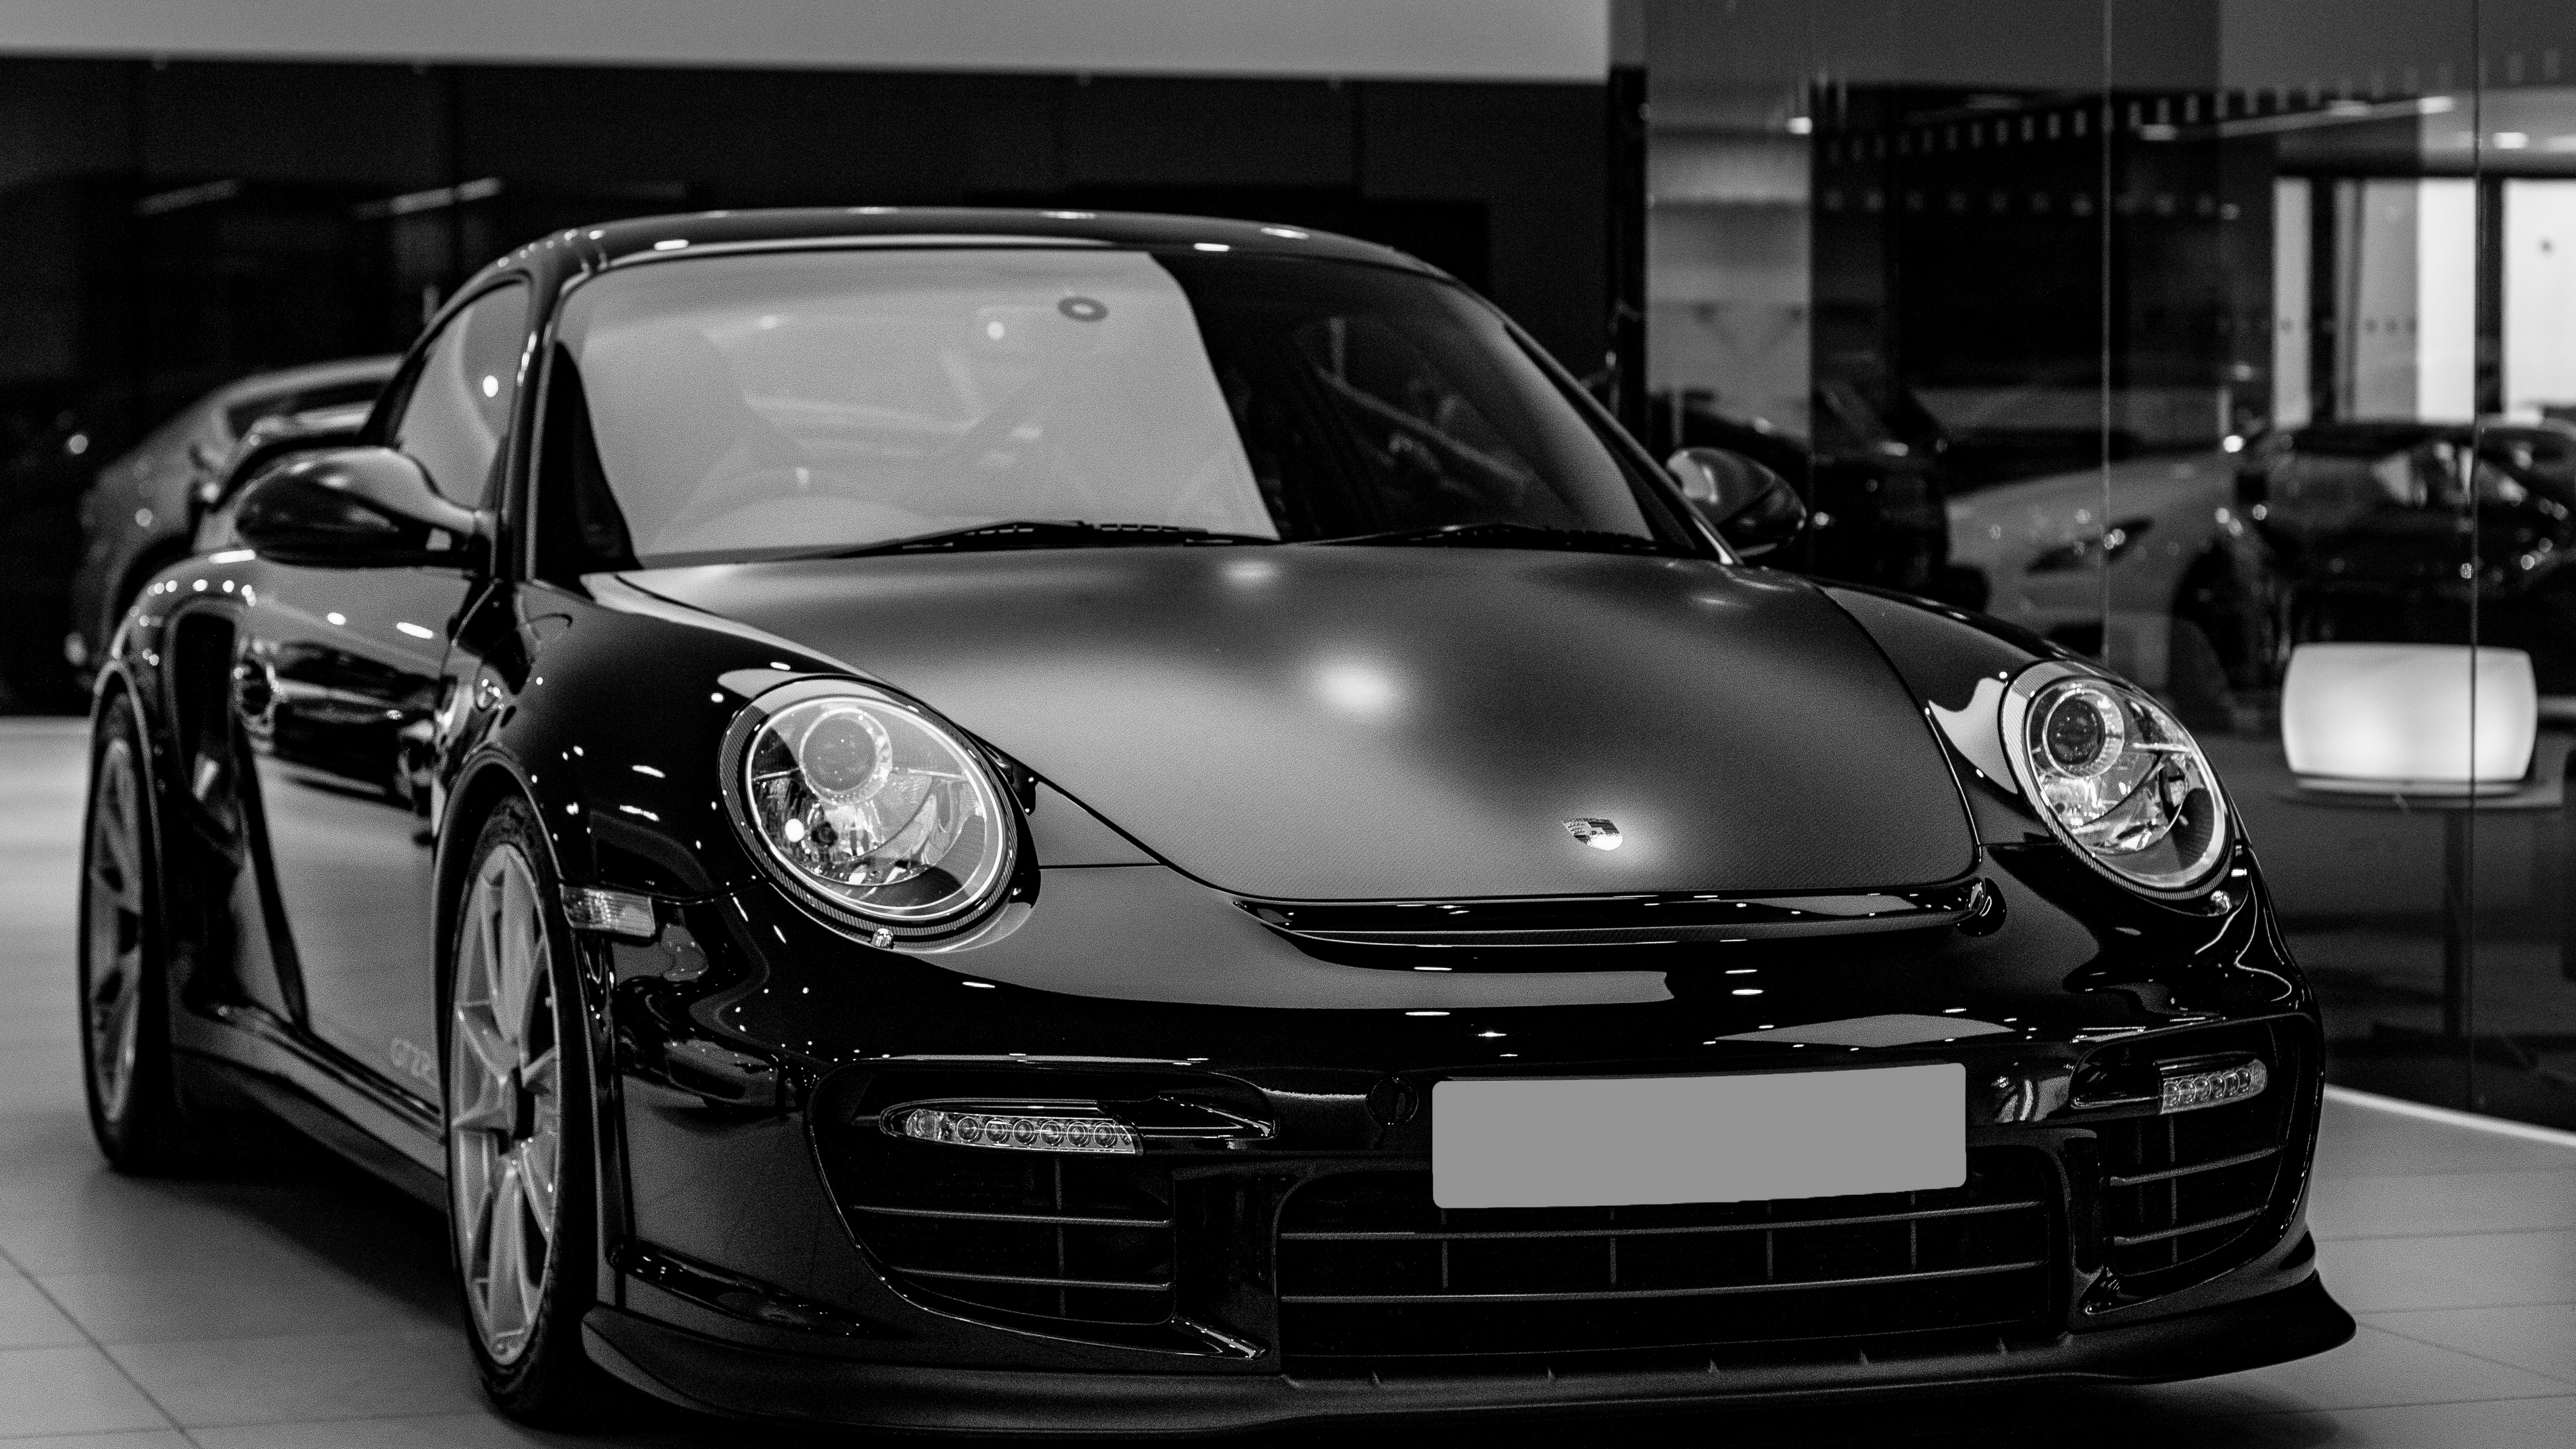 auto black headlight bw 4k 1538935238 - auto, black, headlight, bw 4k - headlight, Black, auto